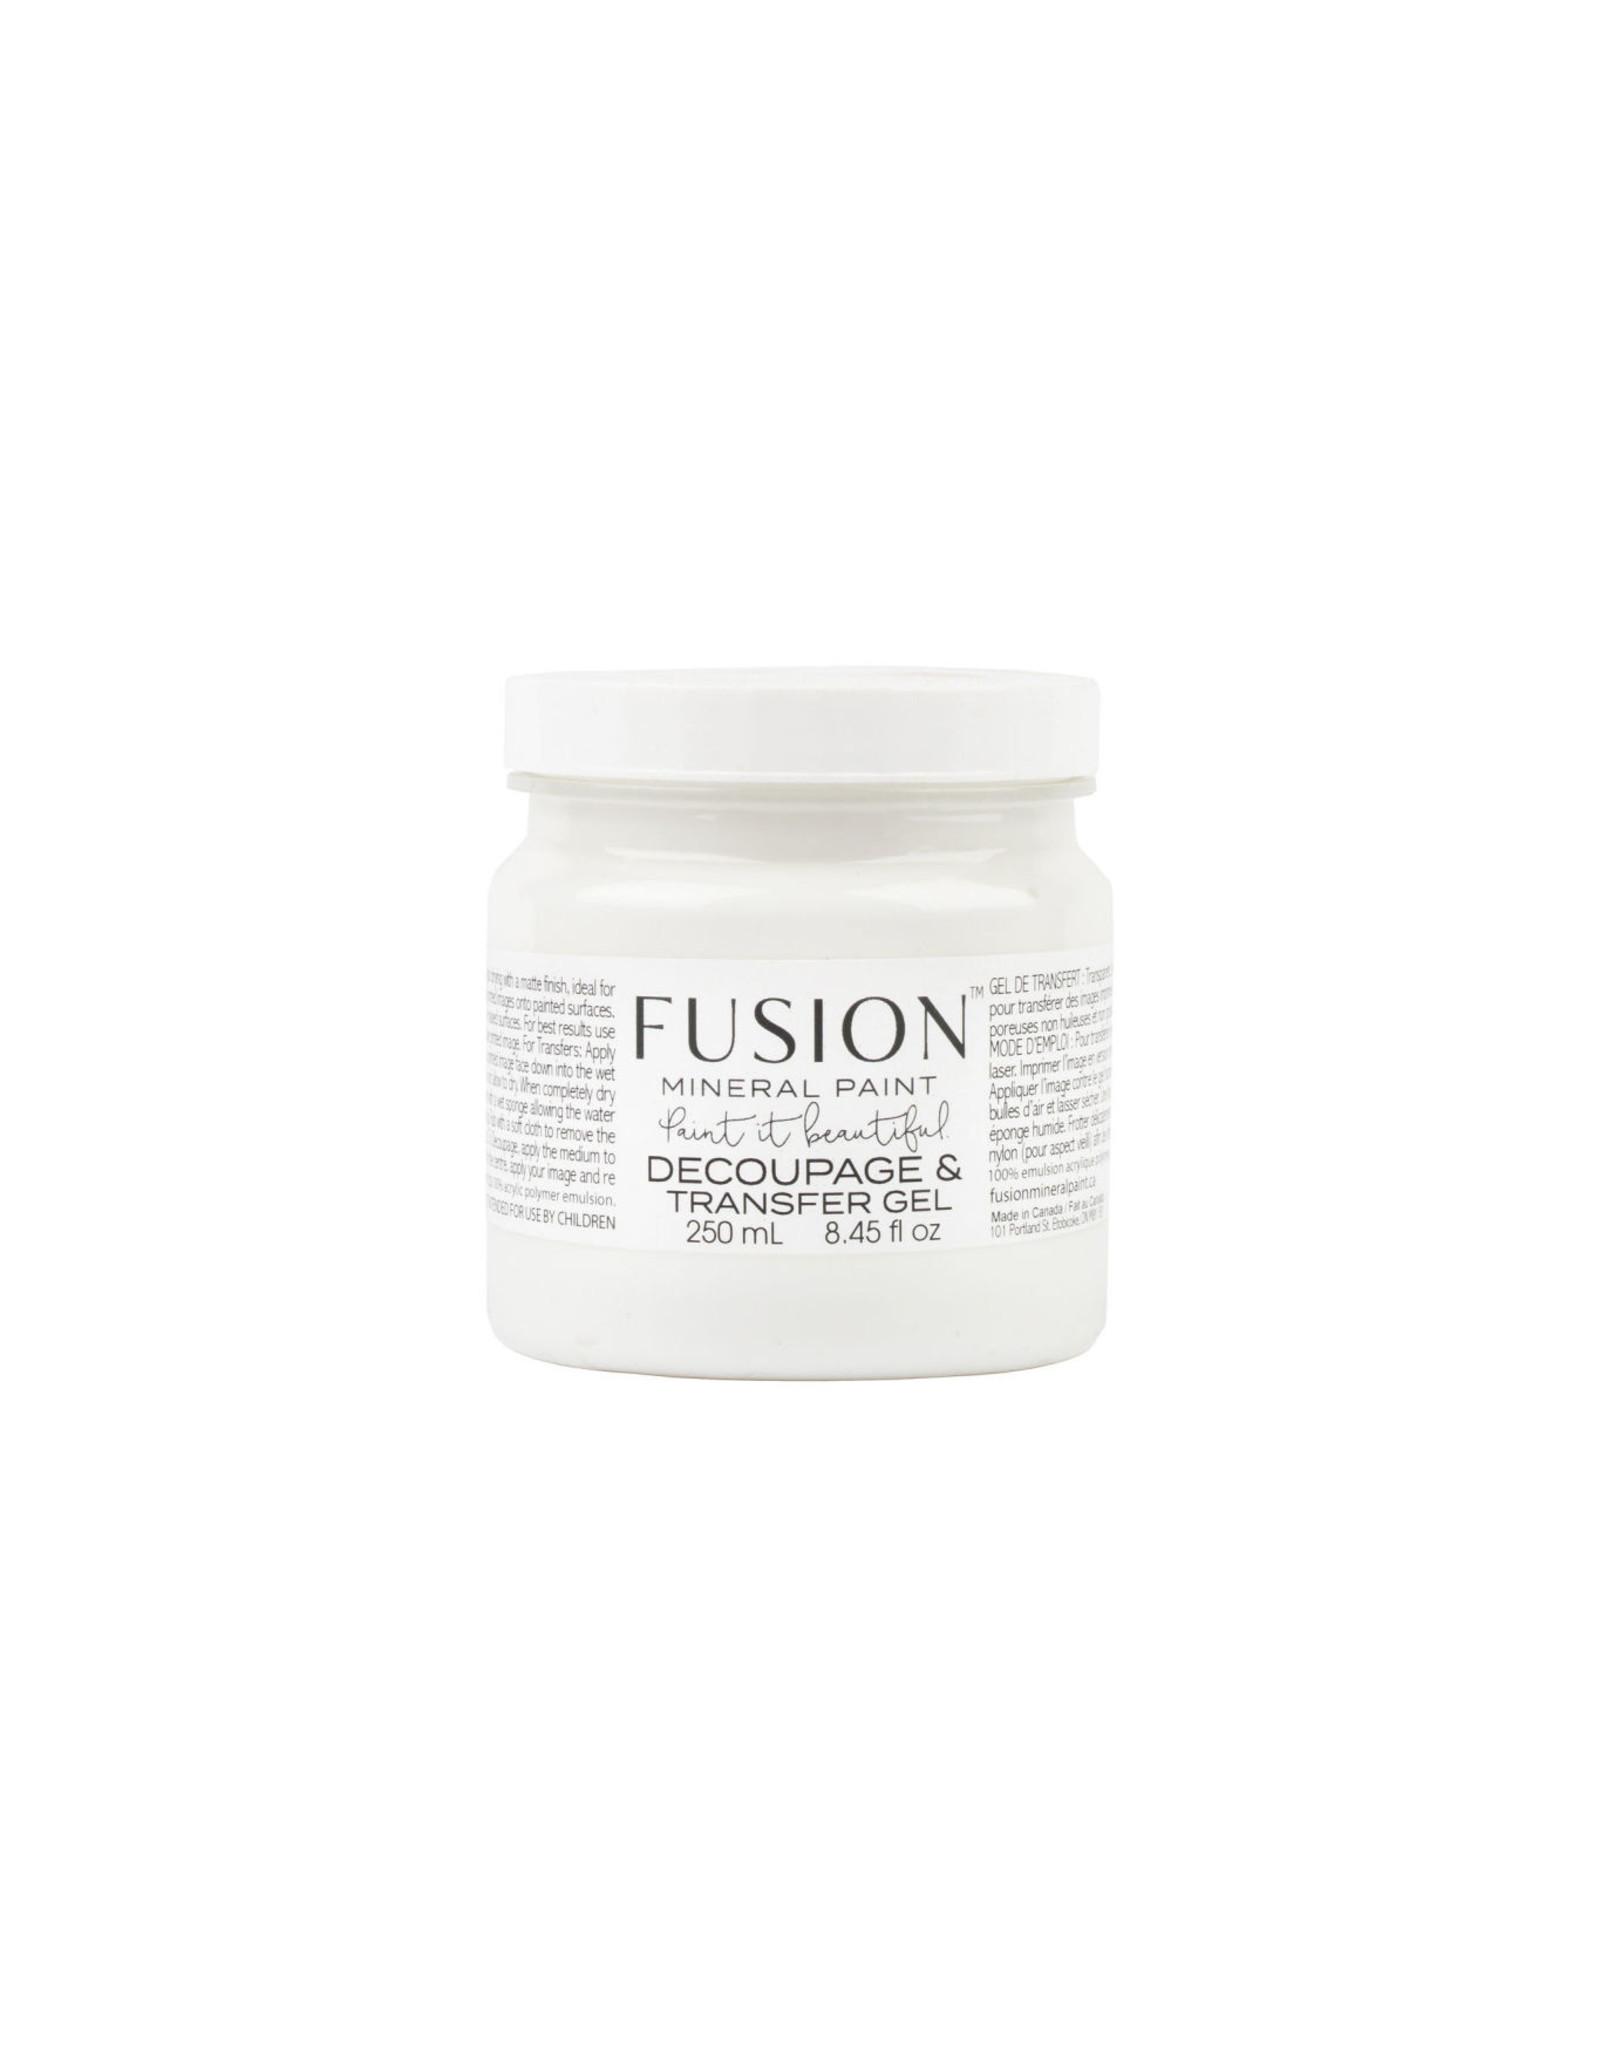 Fusion Mineral Paint Decoupage & Transfer Gel 250ml